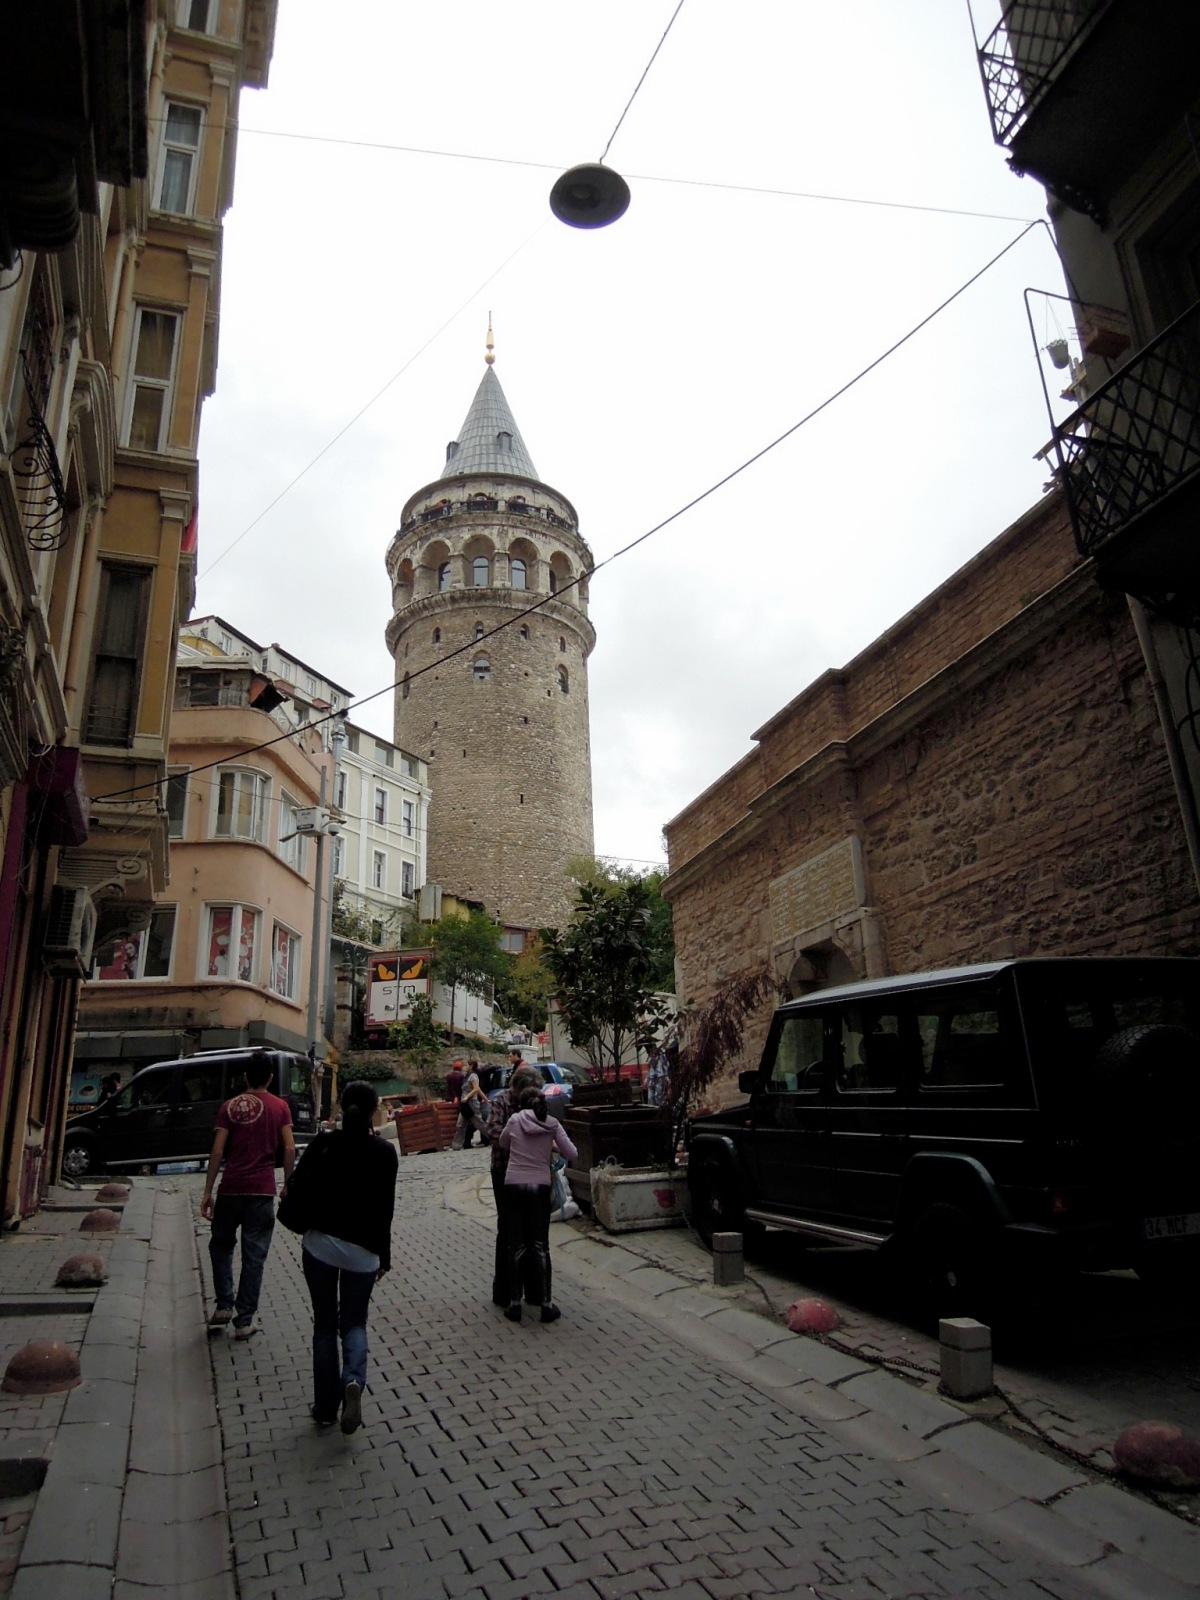 Galata Tower seen from Lüleci Hendek Caddesi